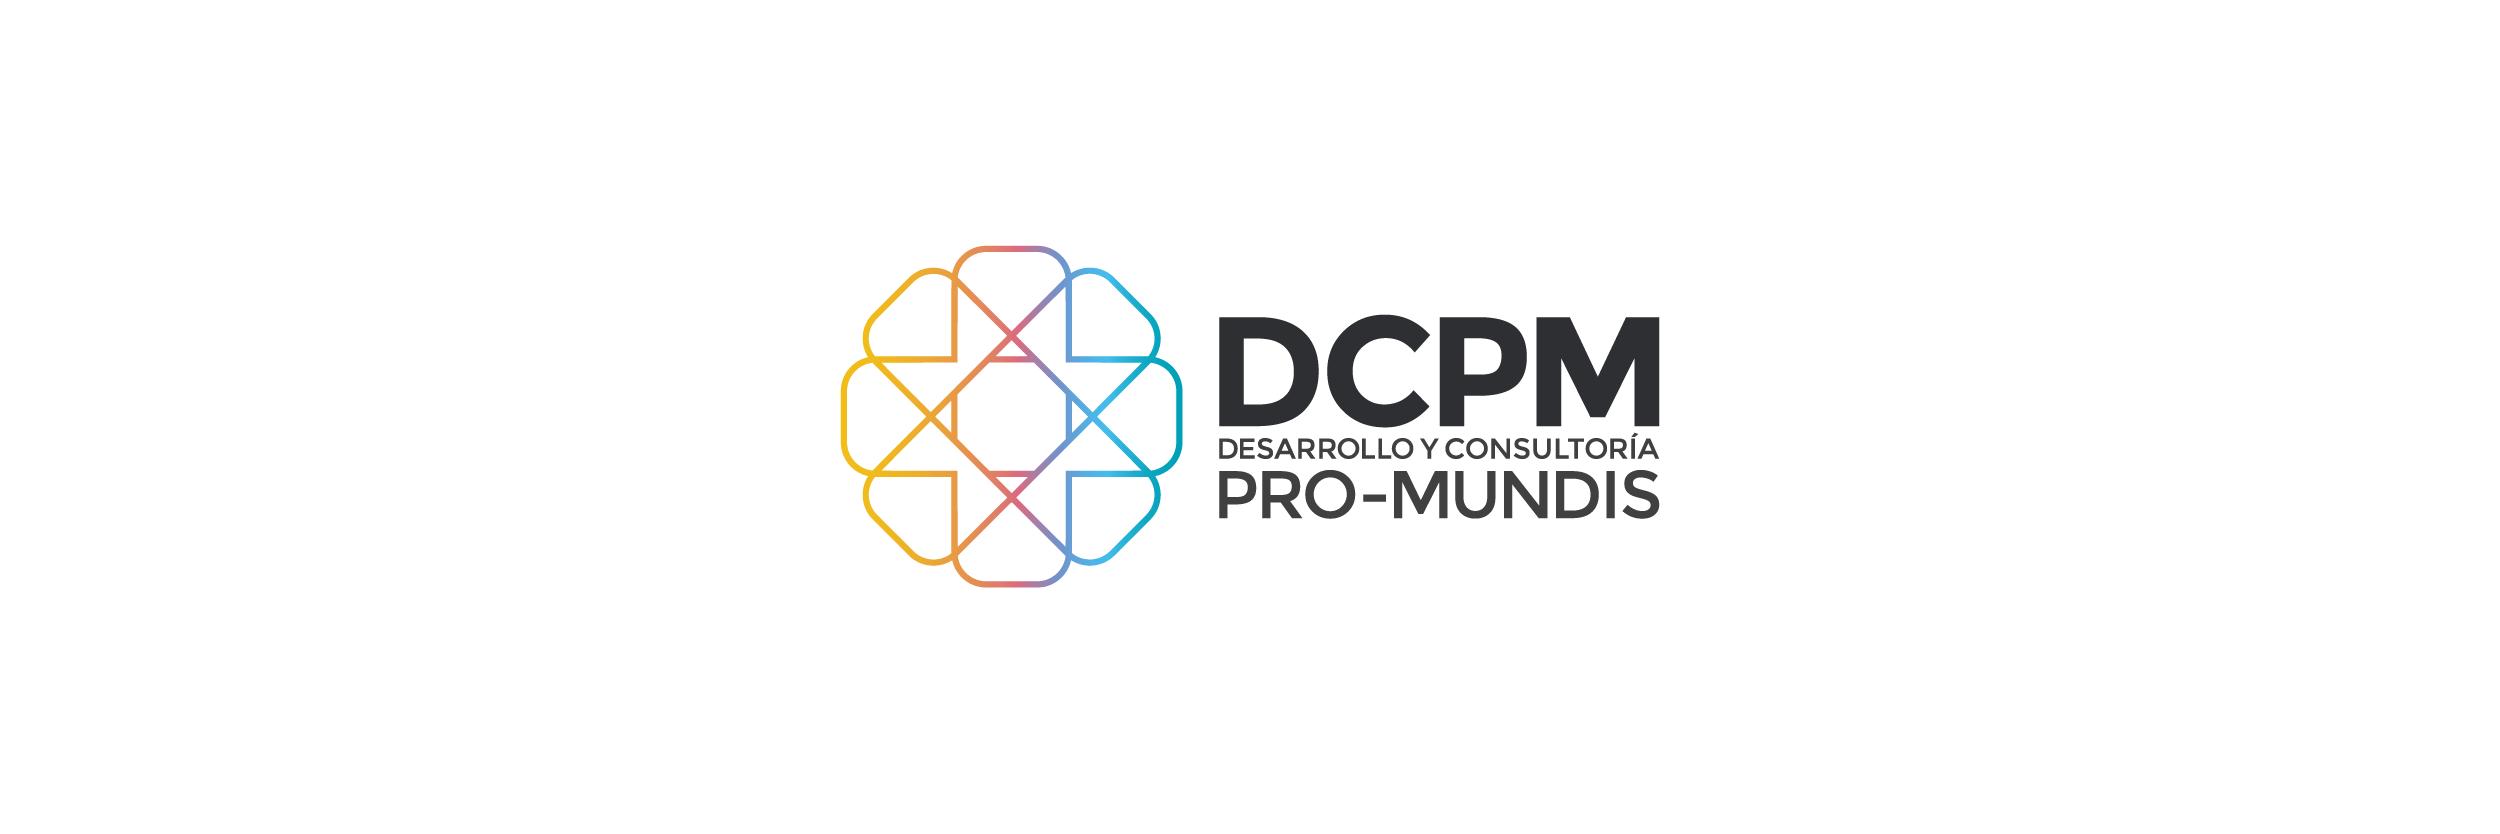 DCPM by Filipe Amado